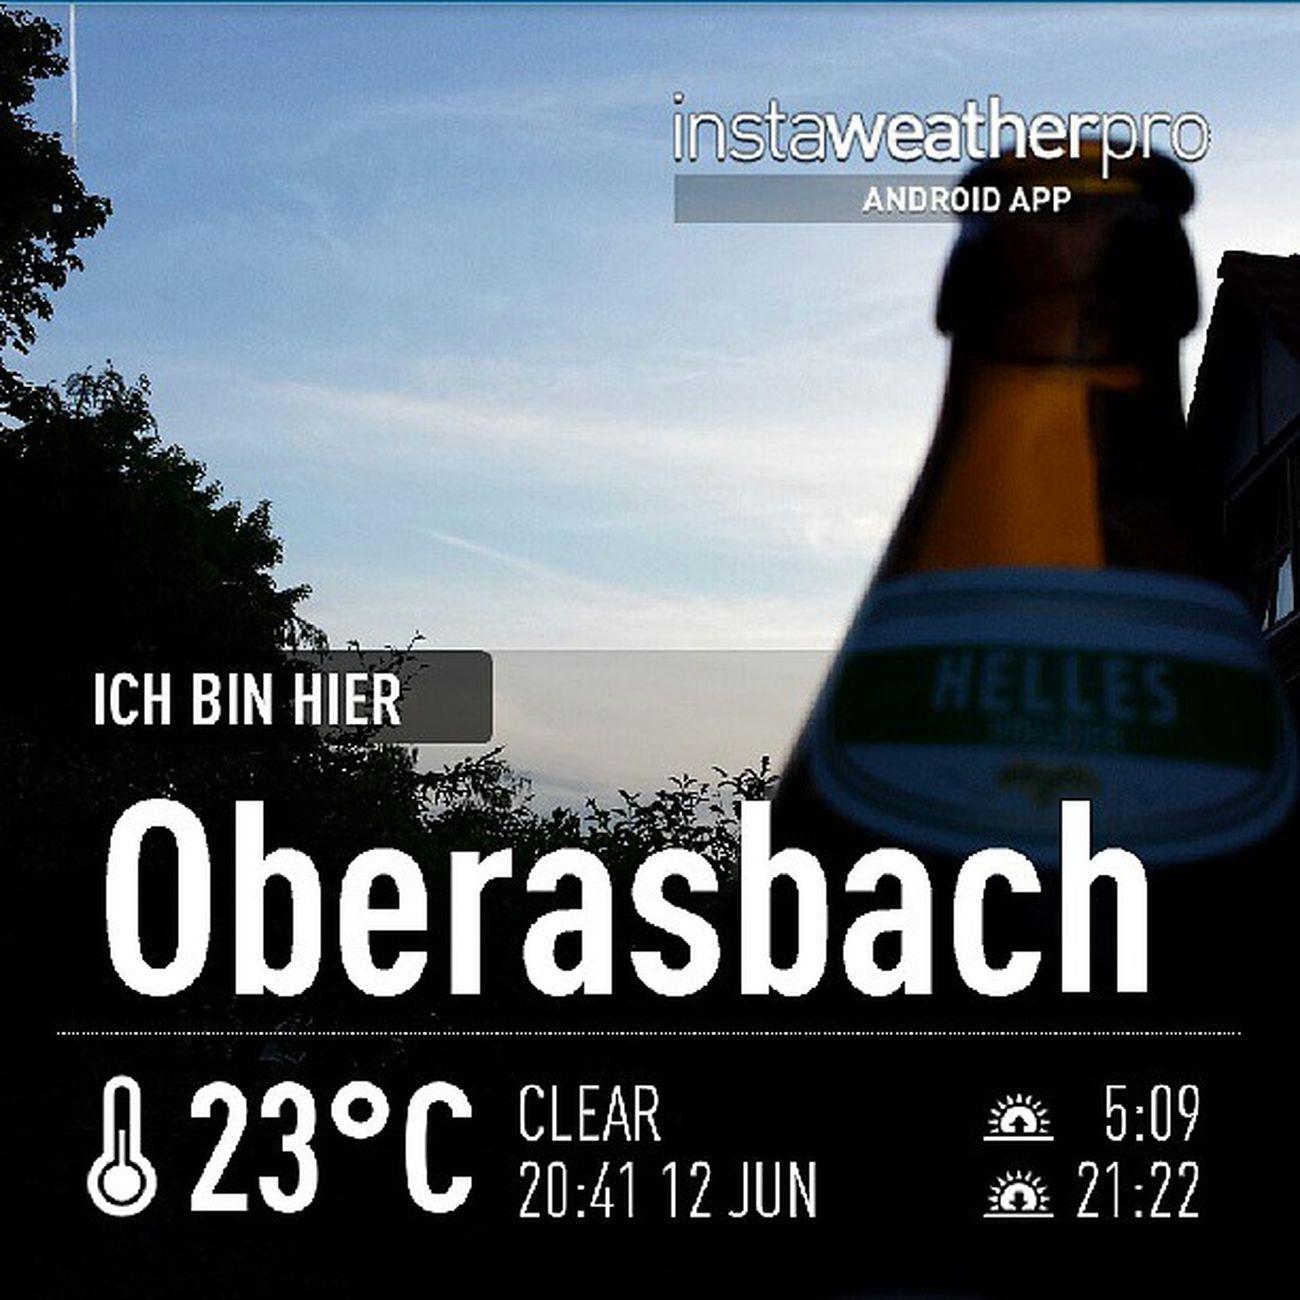 Weather Instaweather Instaweatherpro Androidonly androidnesia instagood Oberasbach Deutschland beer augustiner